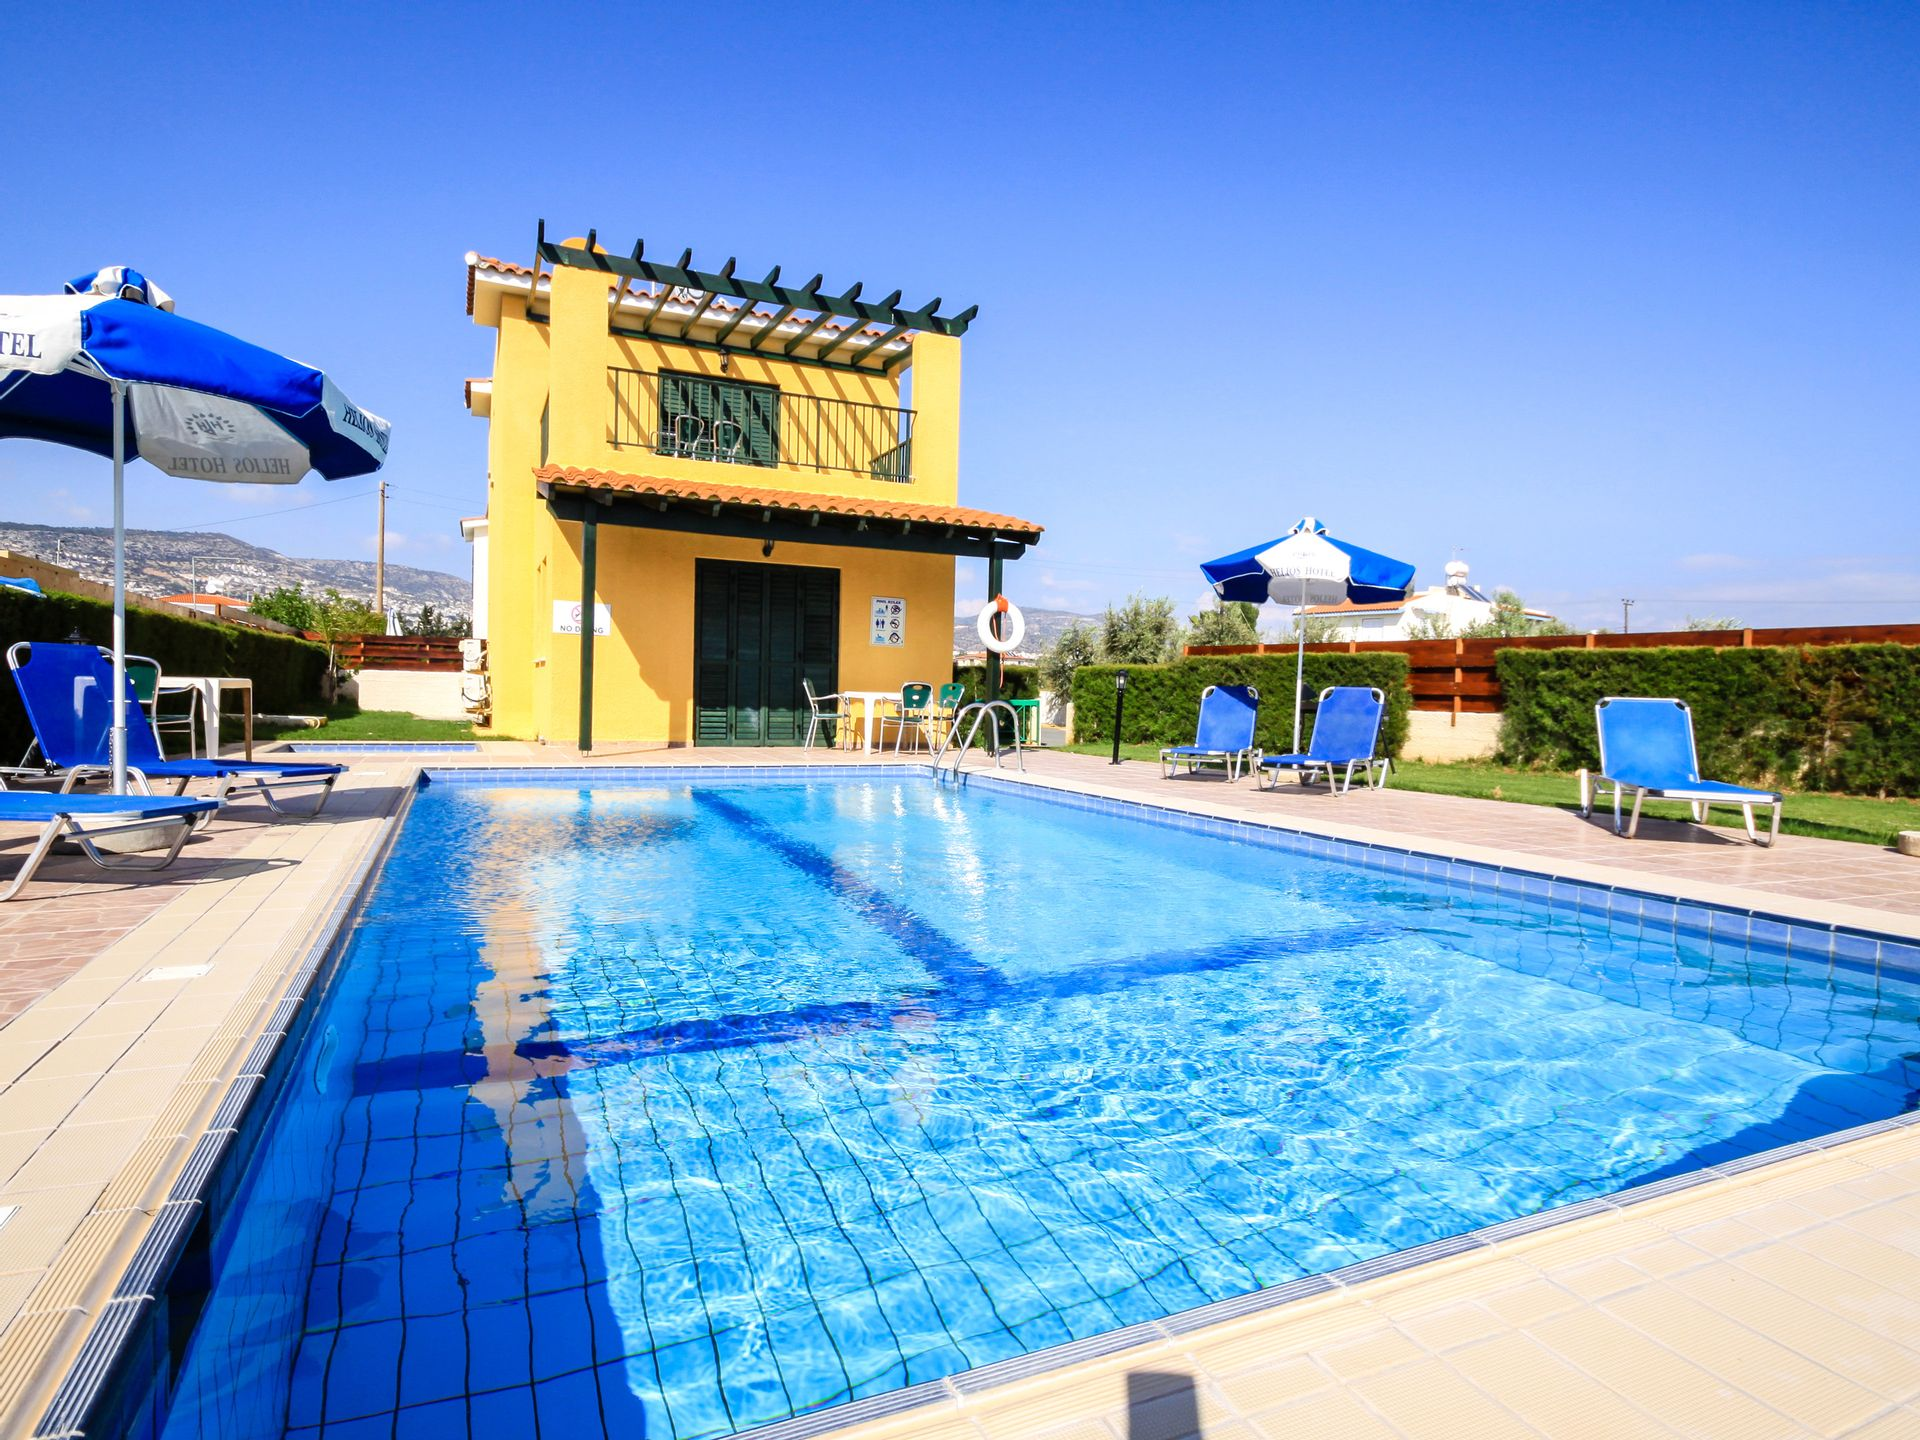 Kotsias Korallia Villas - Πάφος, Κύπρος ✦ 8 Ημέρες (7 Διανυκτερεύσεις) ✦ 2 άτομα ✦ Χωρίς Πρωινό ✦ 01/09/2021 έως 30/09/2021 ✦ Κοντά σε Παραλία!